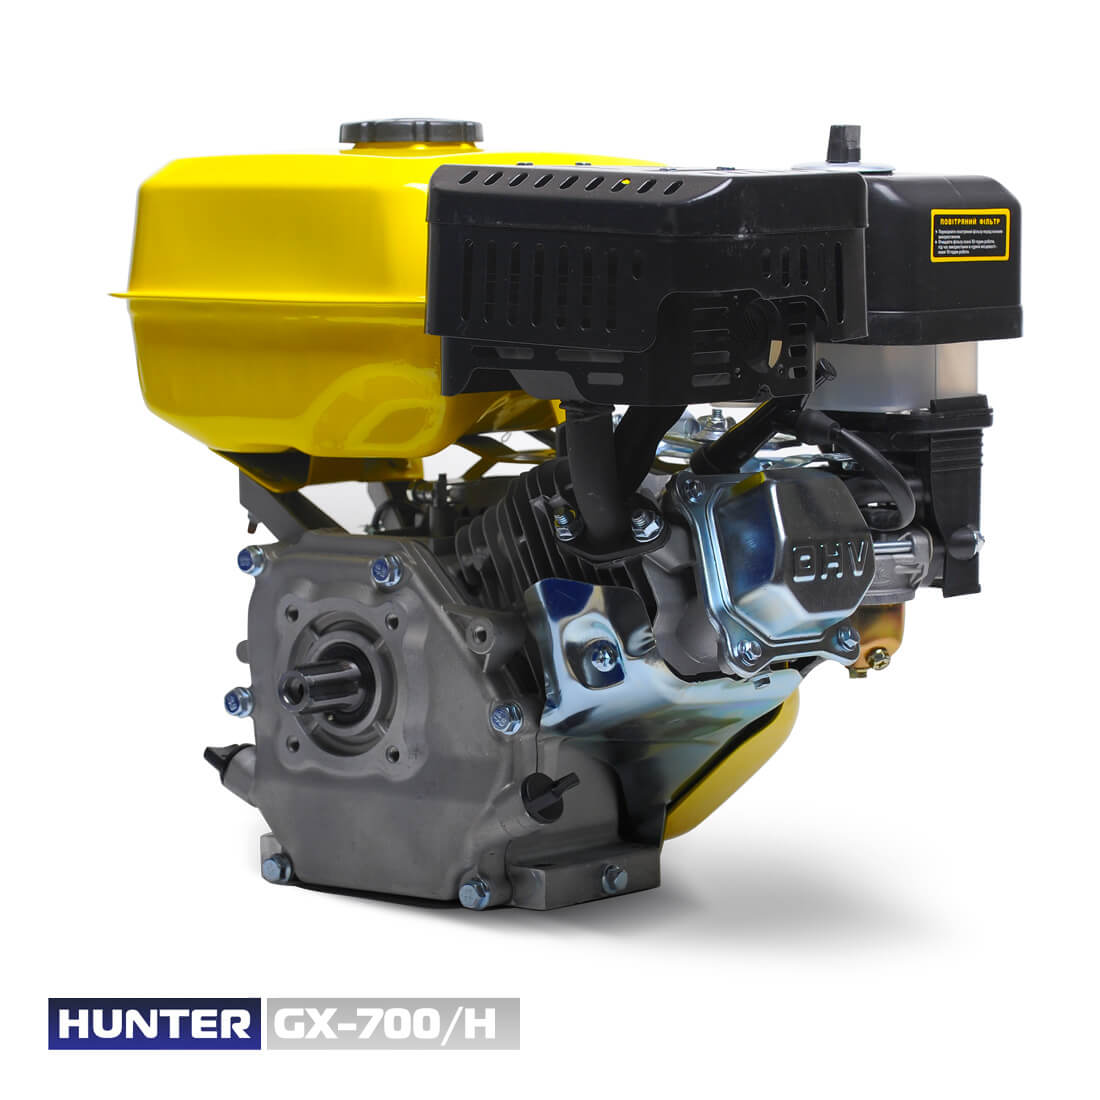 Фото GX-700/H (шлиц) цена 3500грн №4 — Hunter